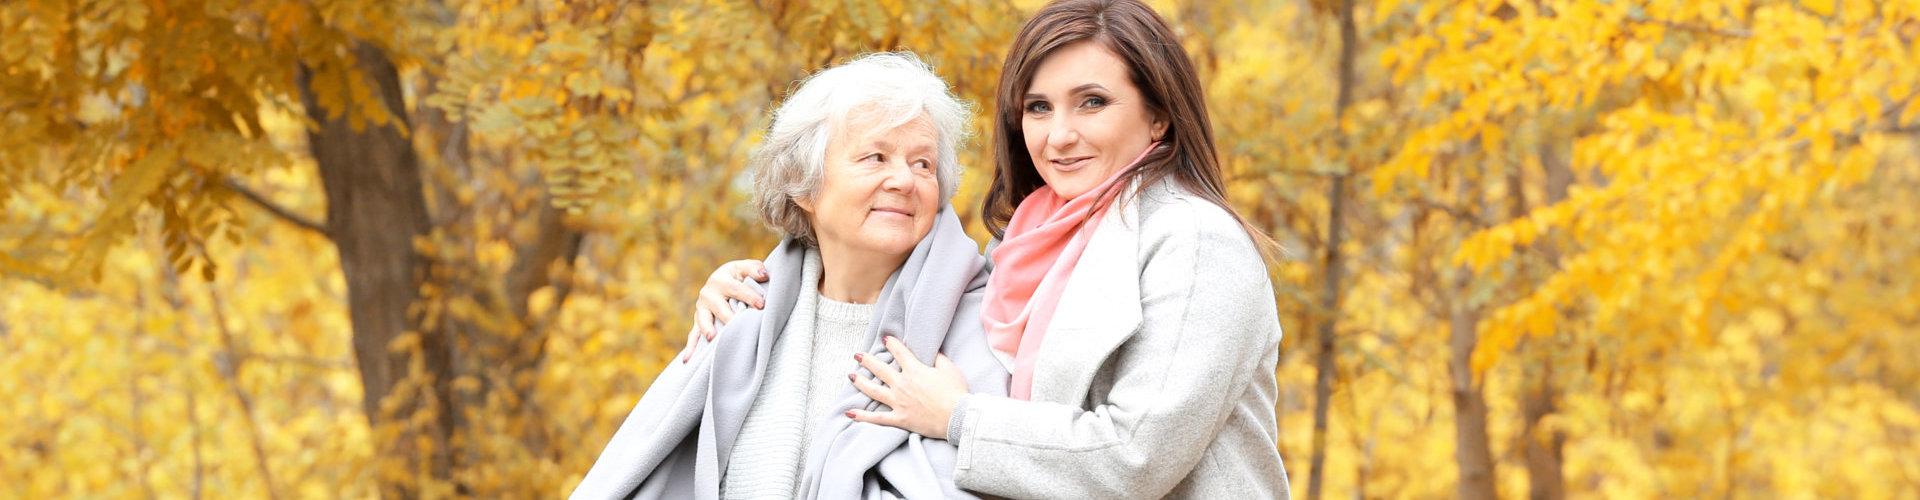 patient and caretaker smiling